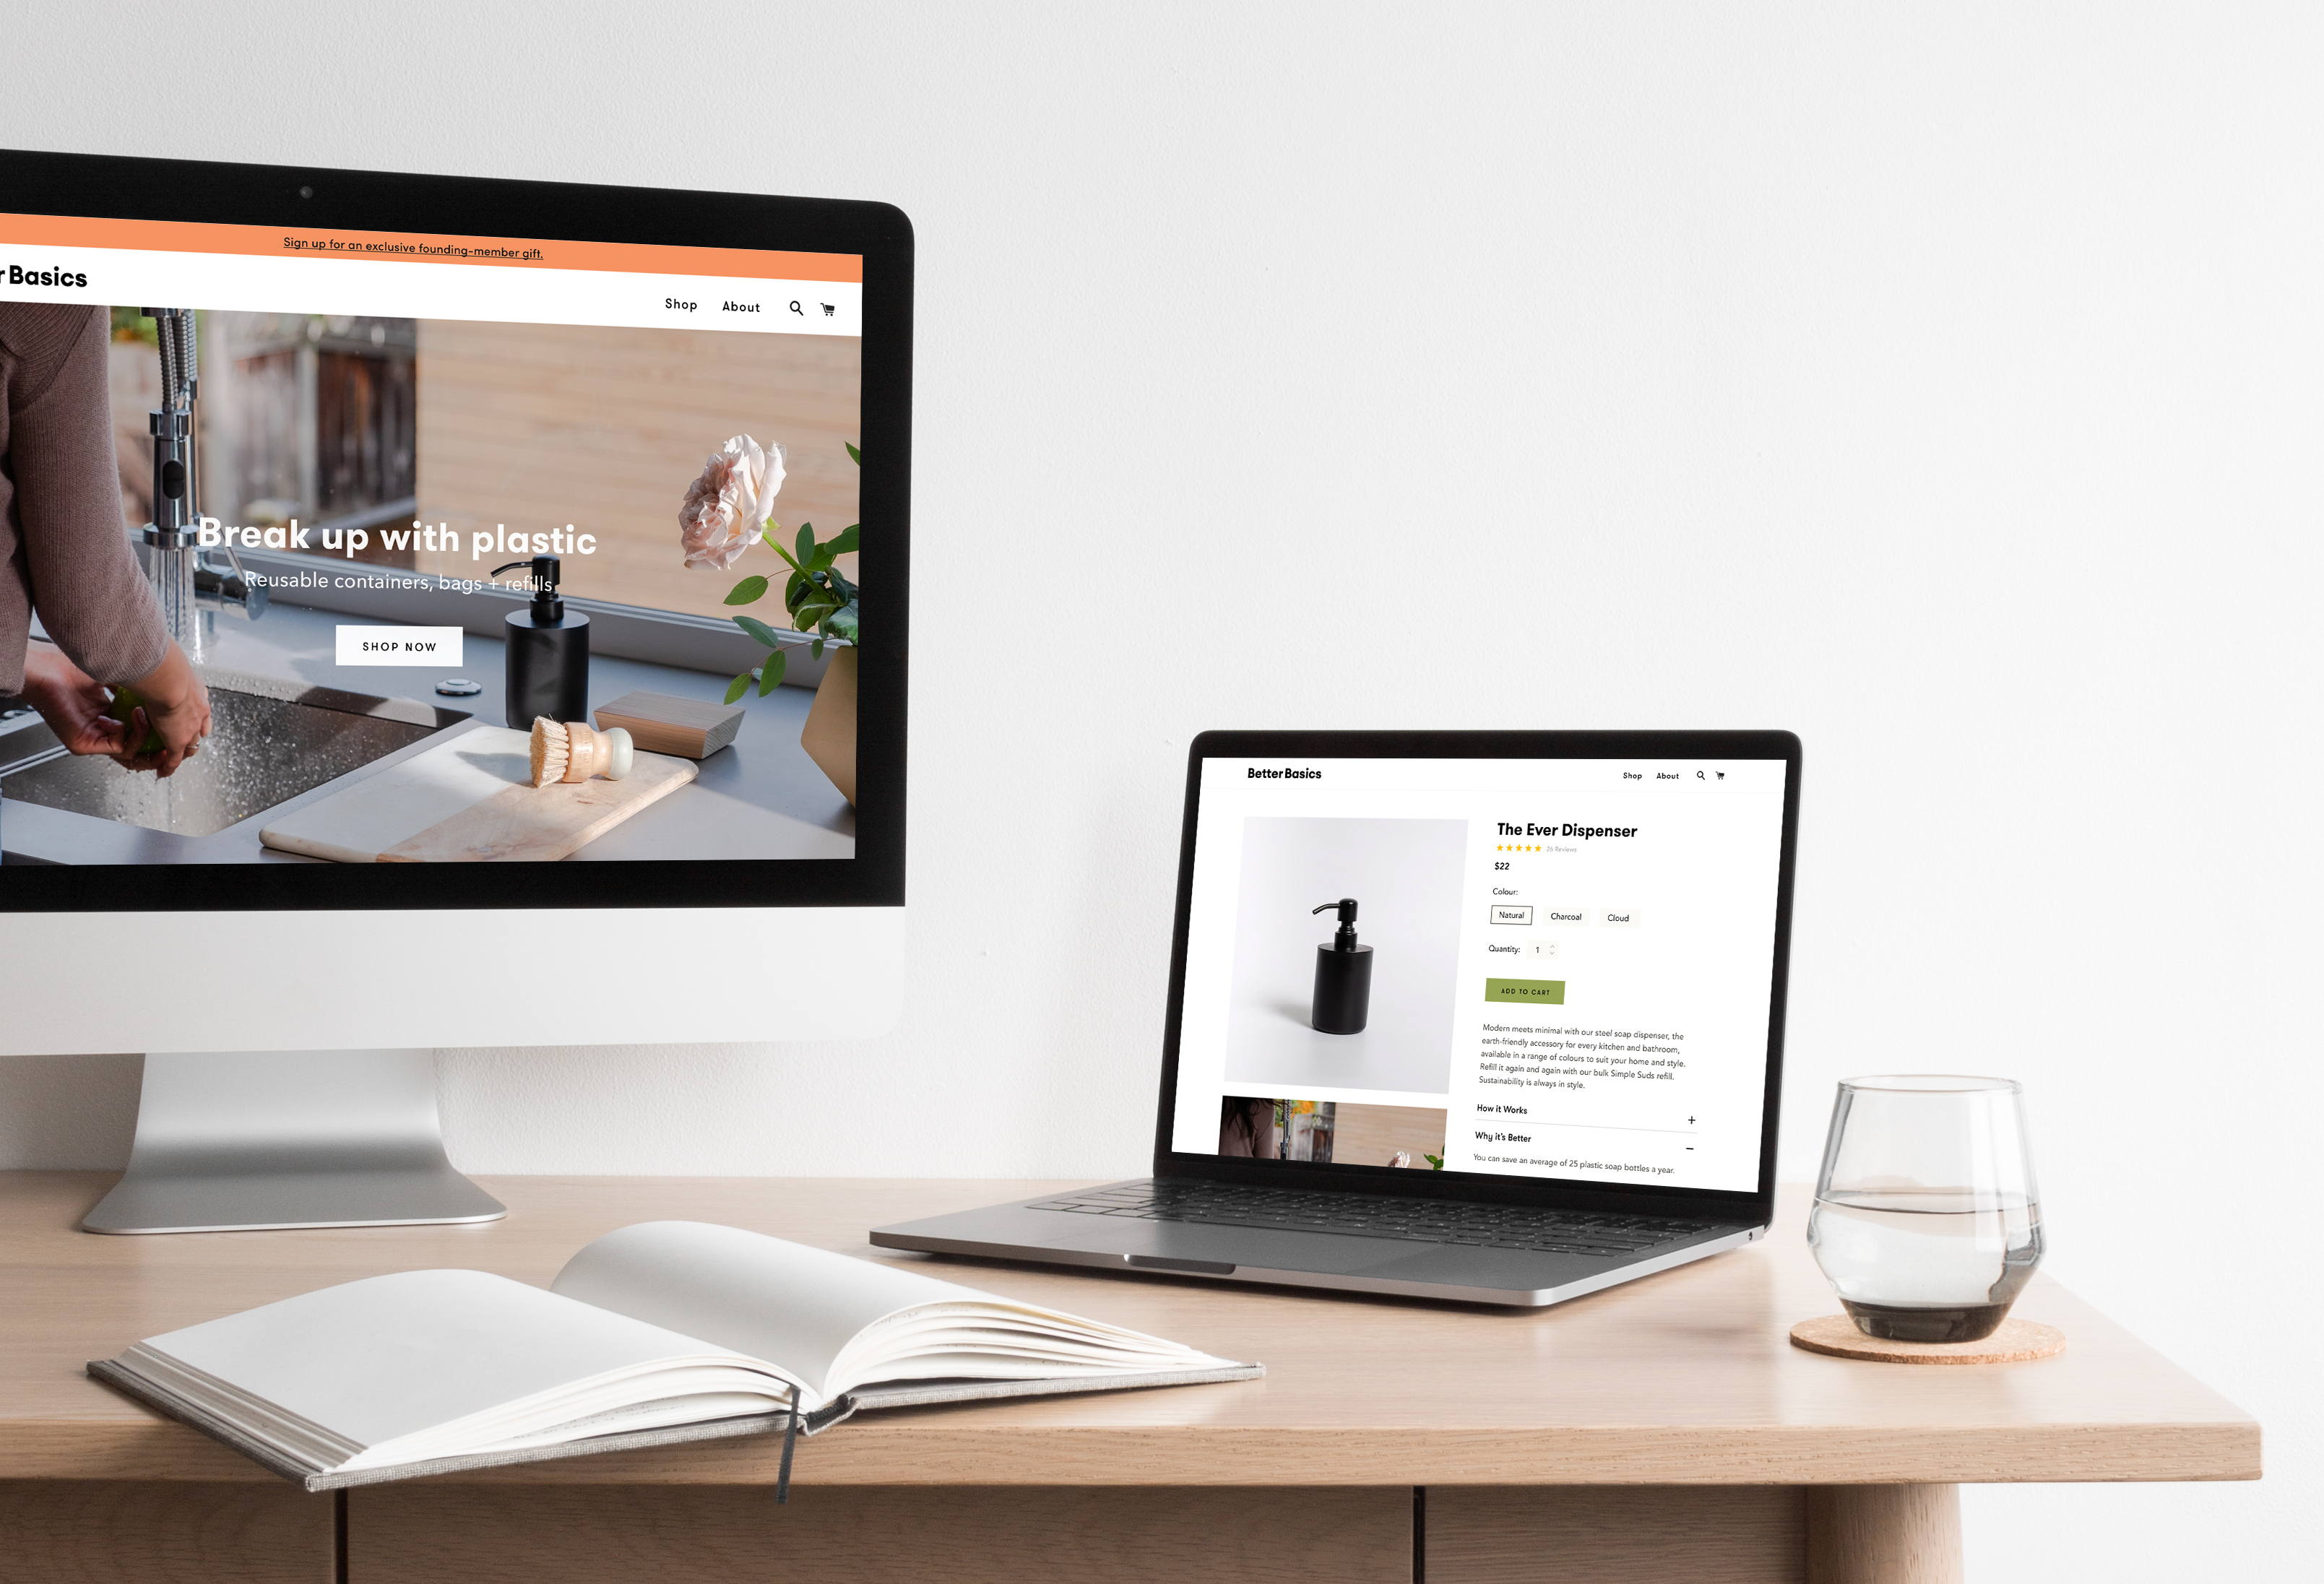 Better Basics Website on a Desktop and Laptop